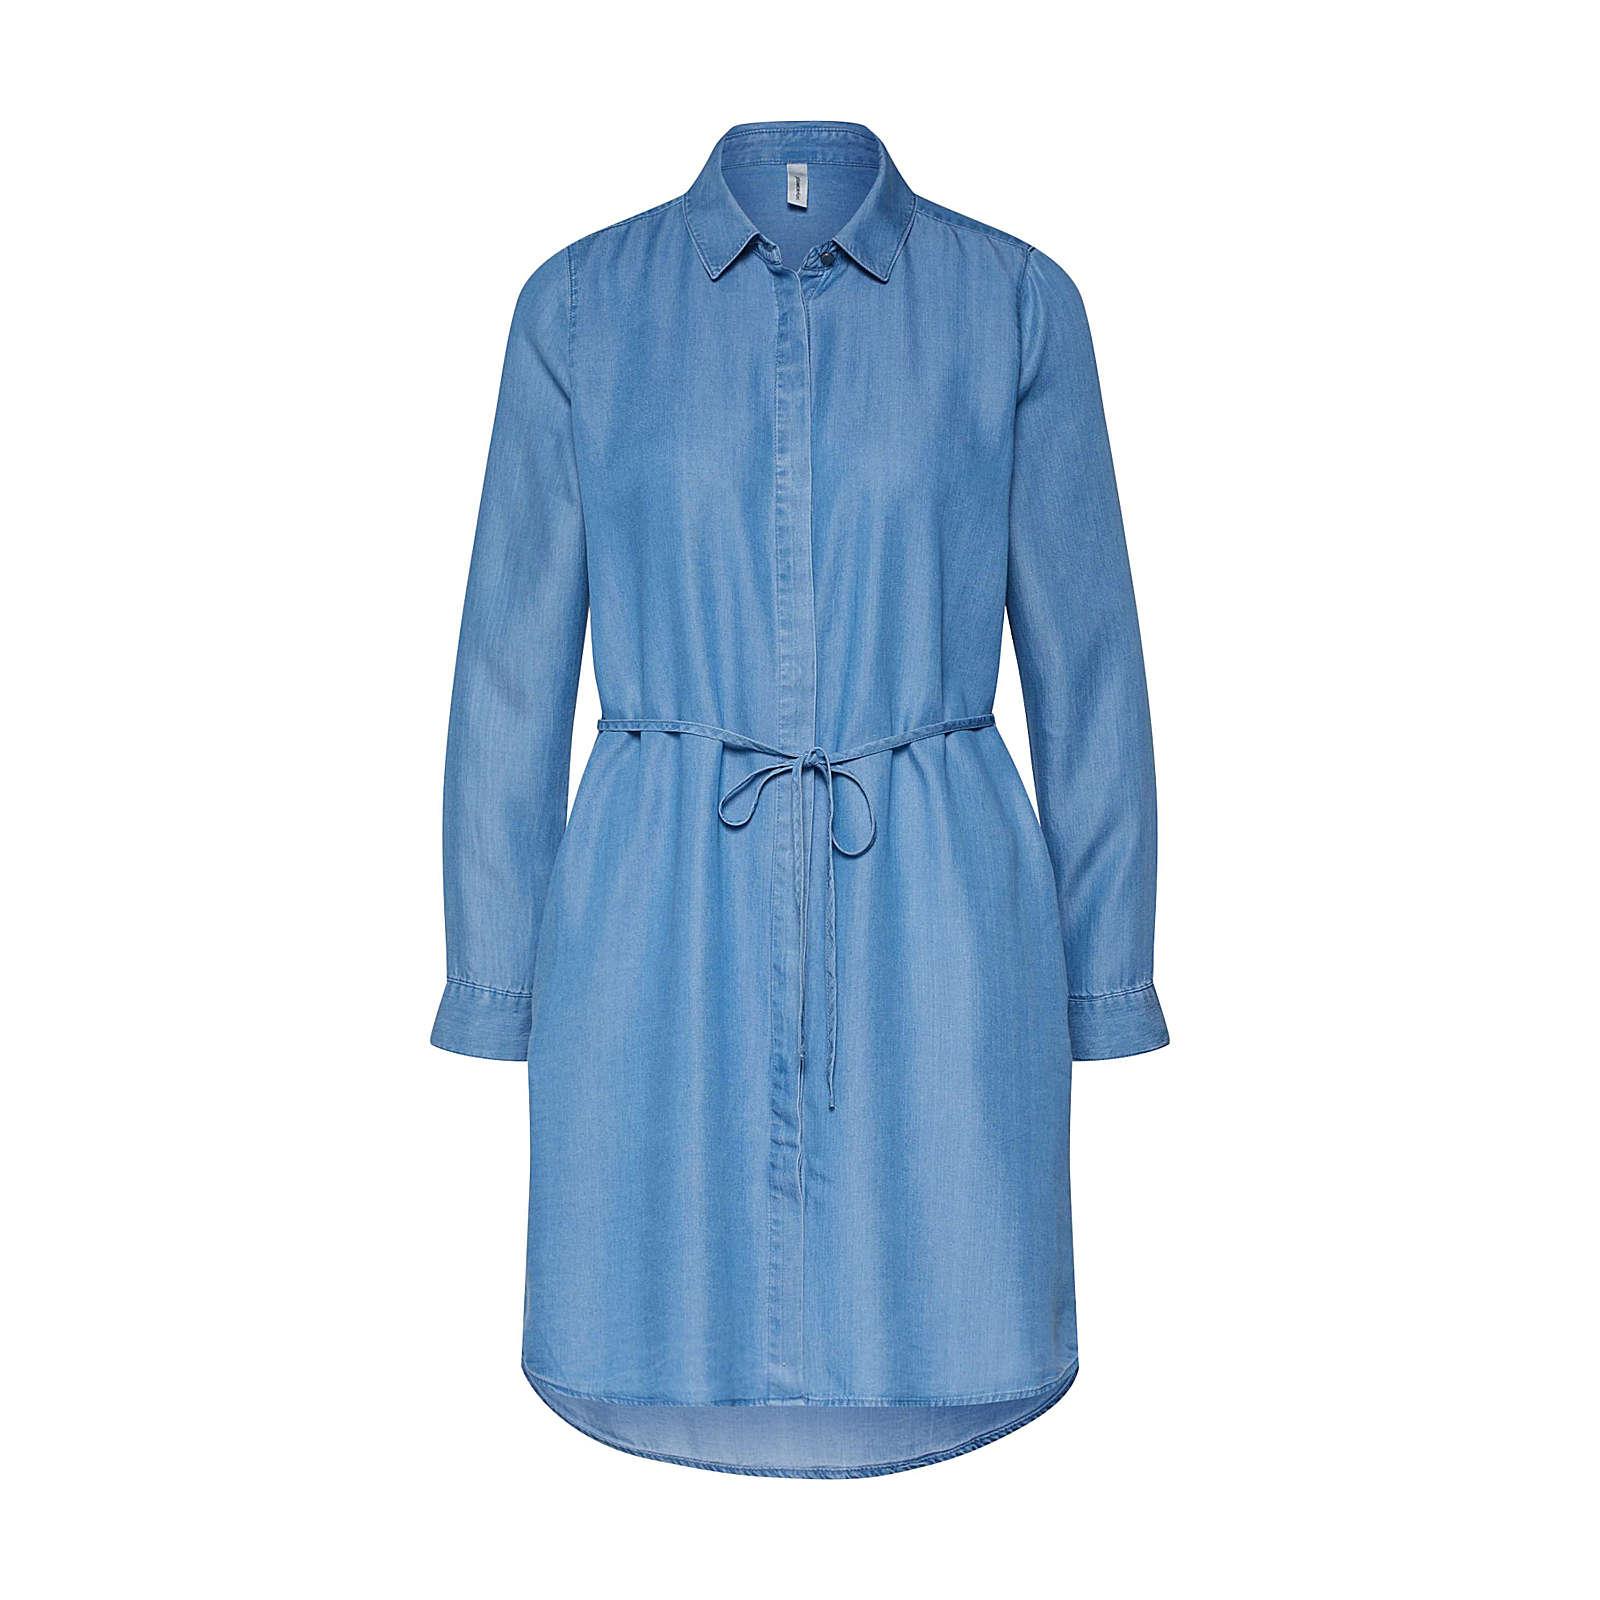 Soyaconcept Blusenkleid LIV 6 Blusenkleider hellblau Damen Gr. 44